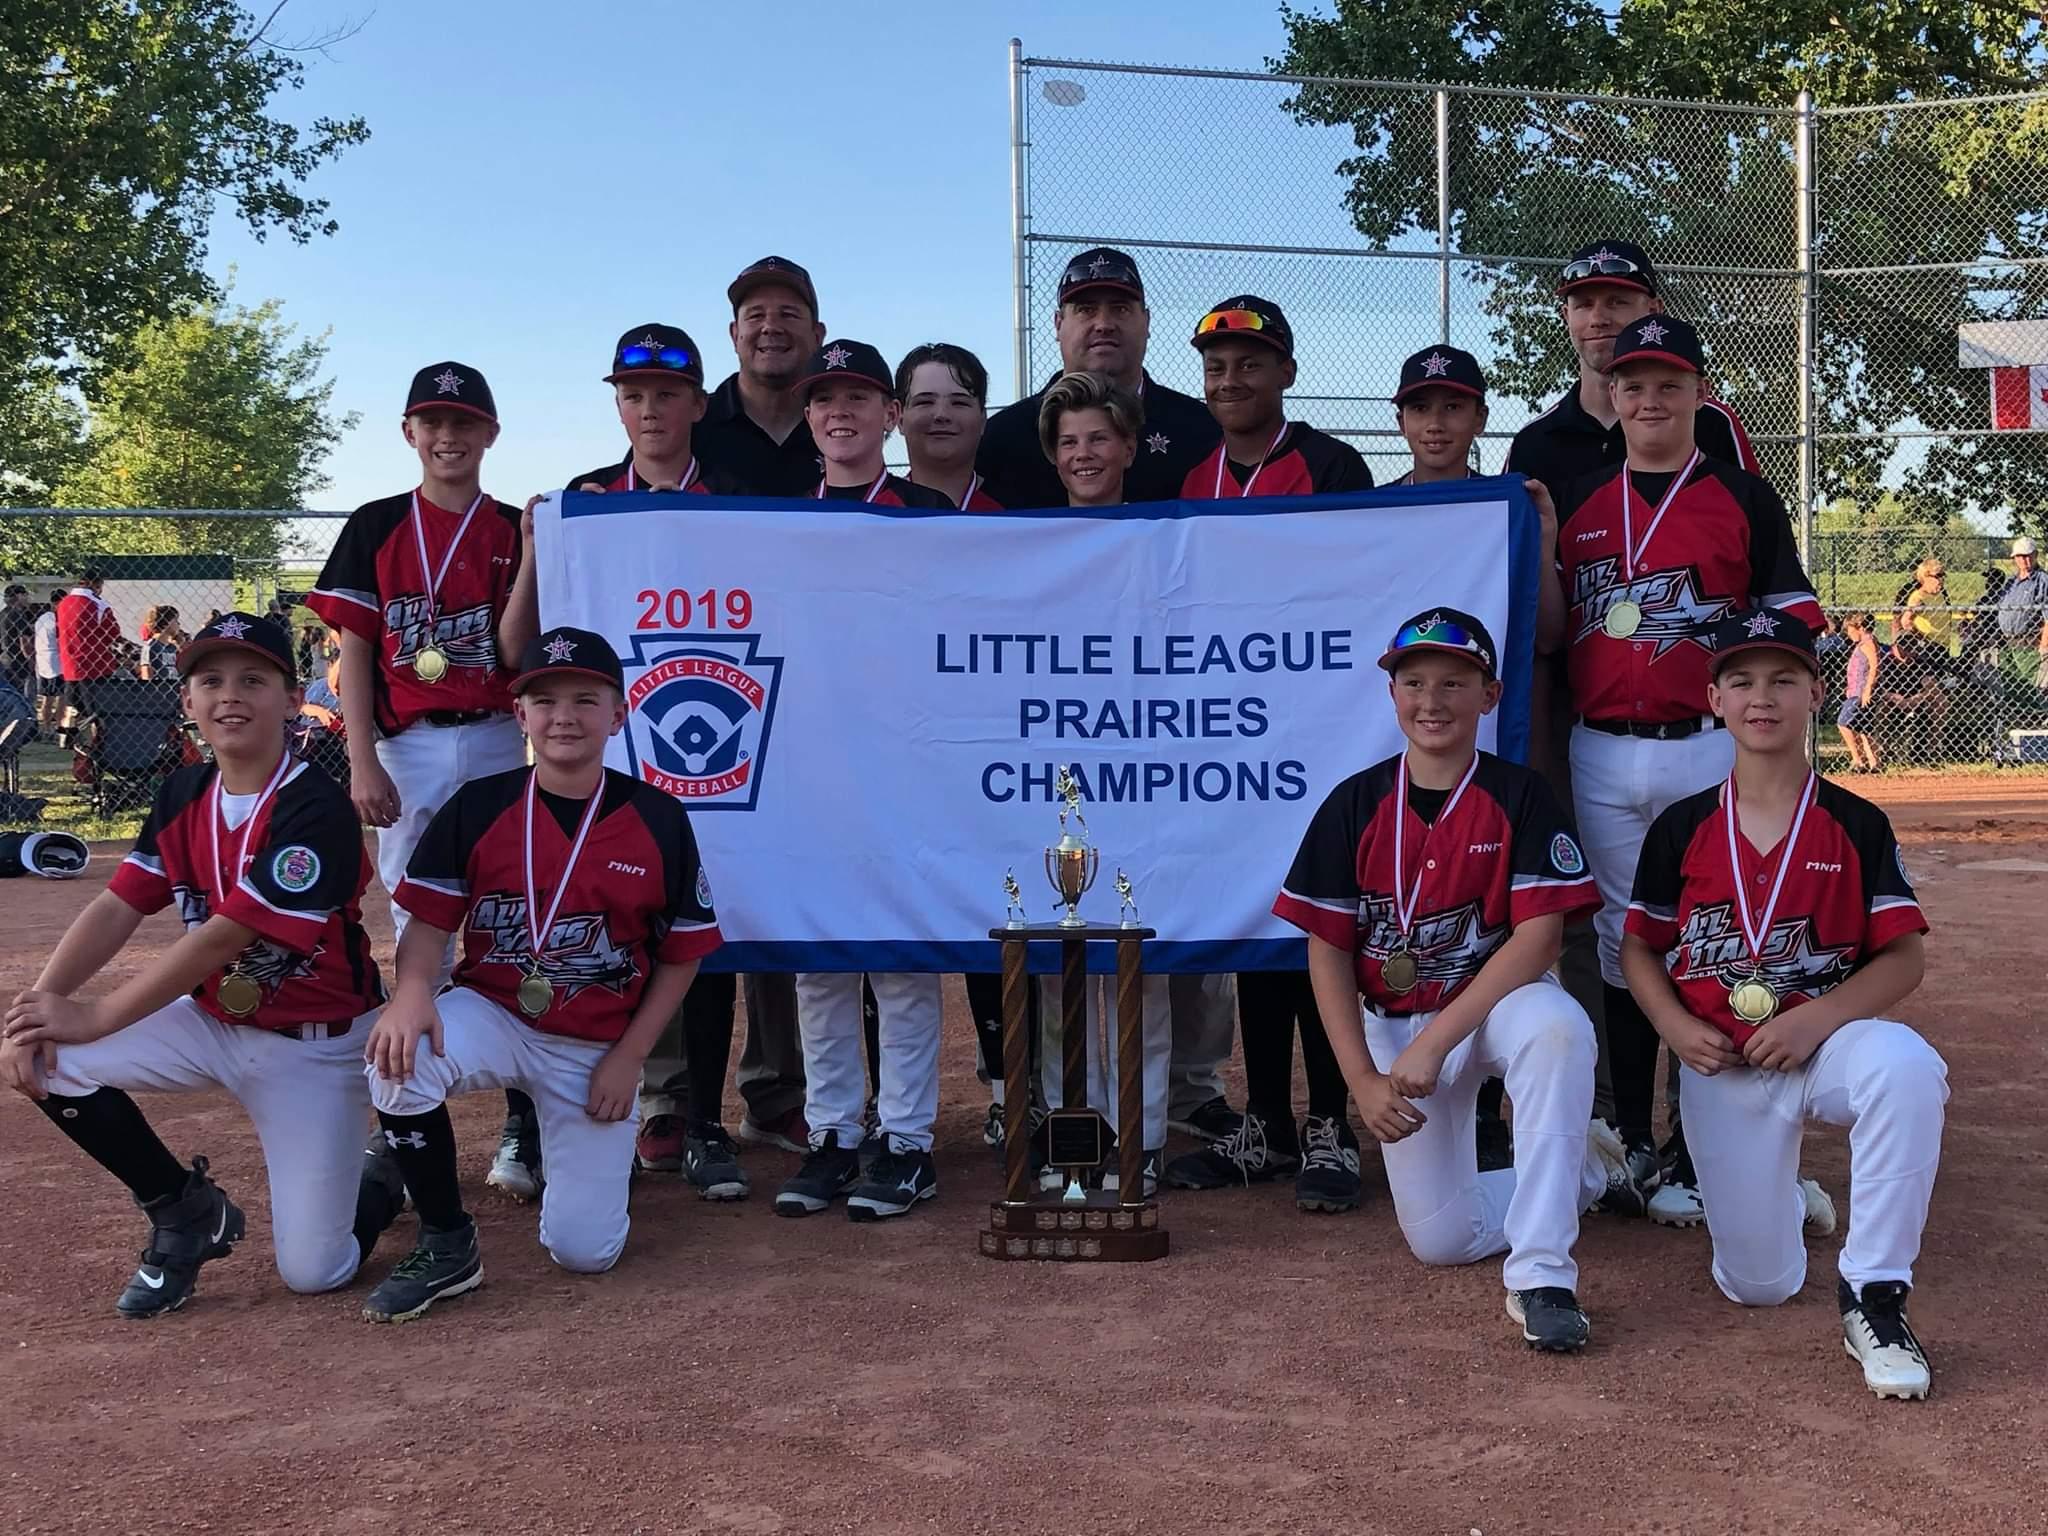 The team with the Prairie pennant